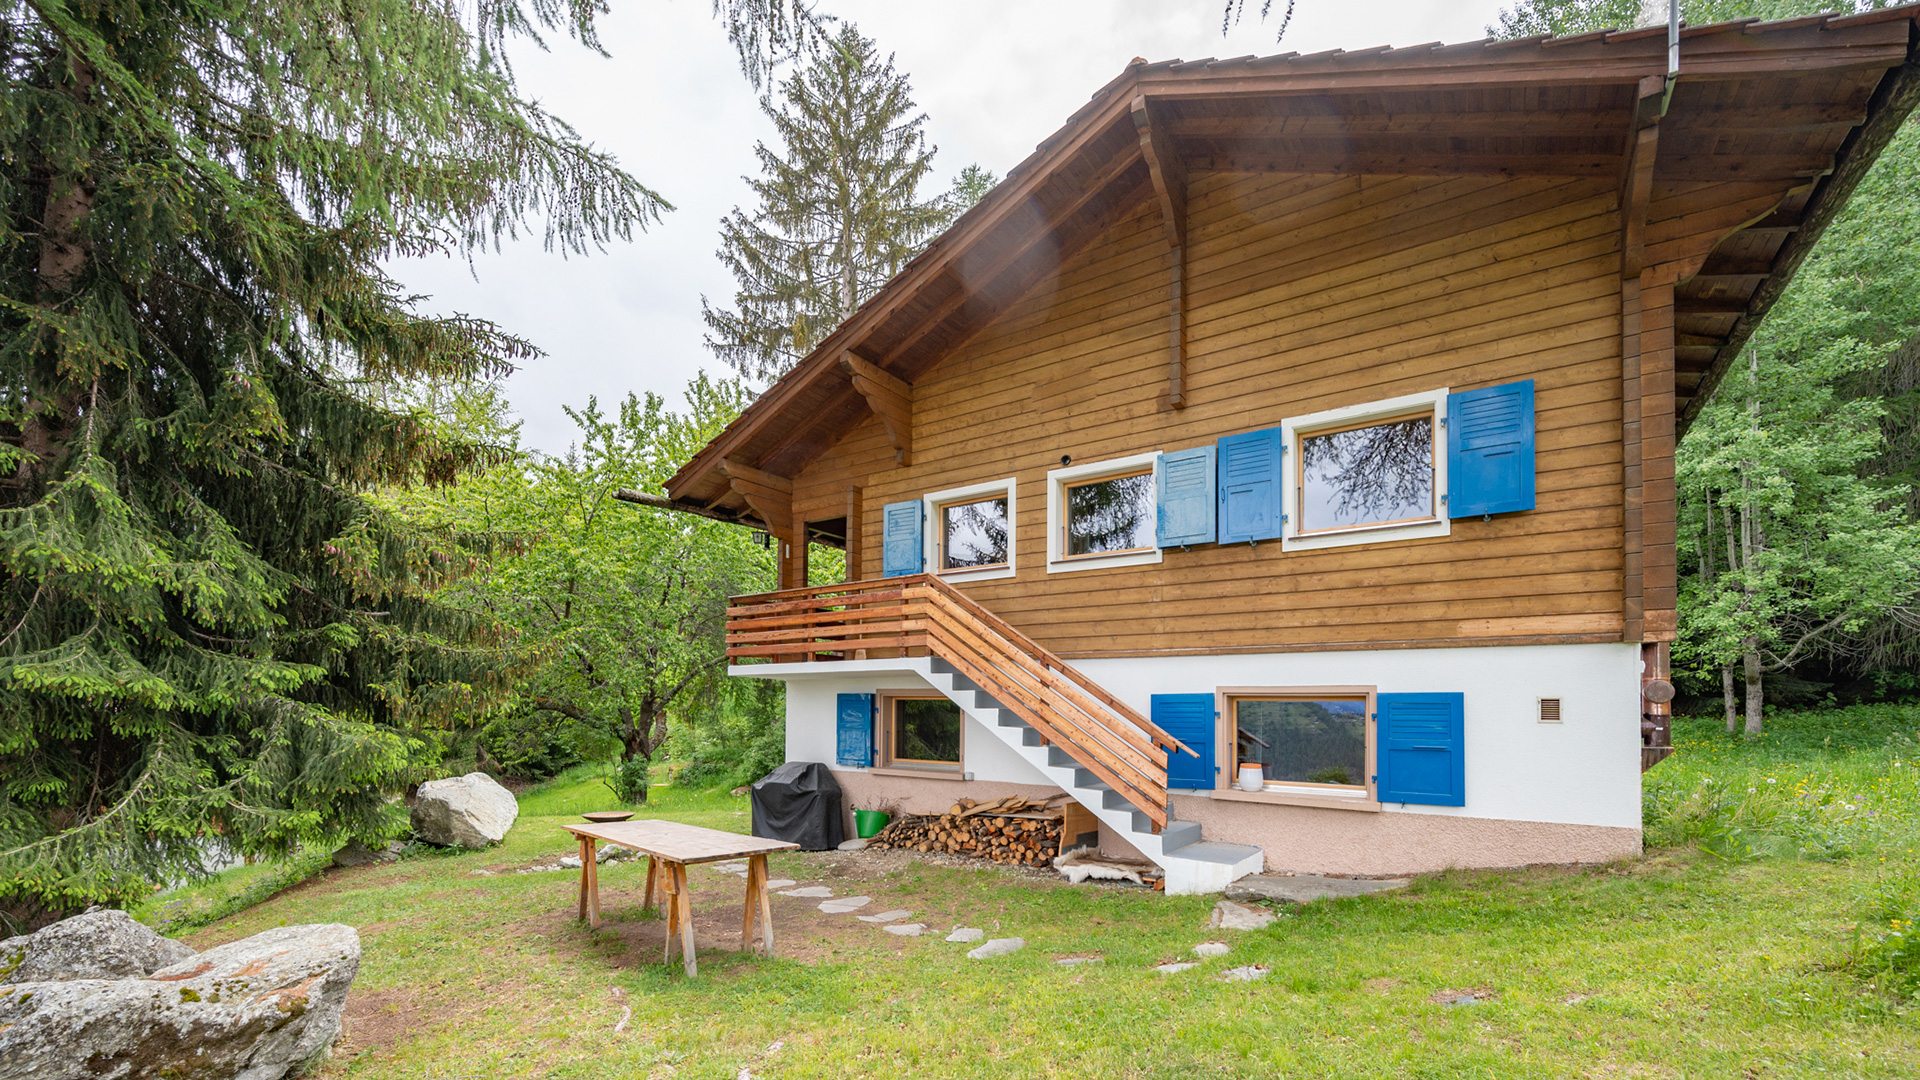 Le Foret Bleu Chalet, Switzerland